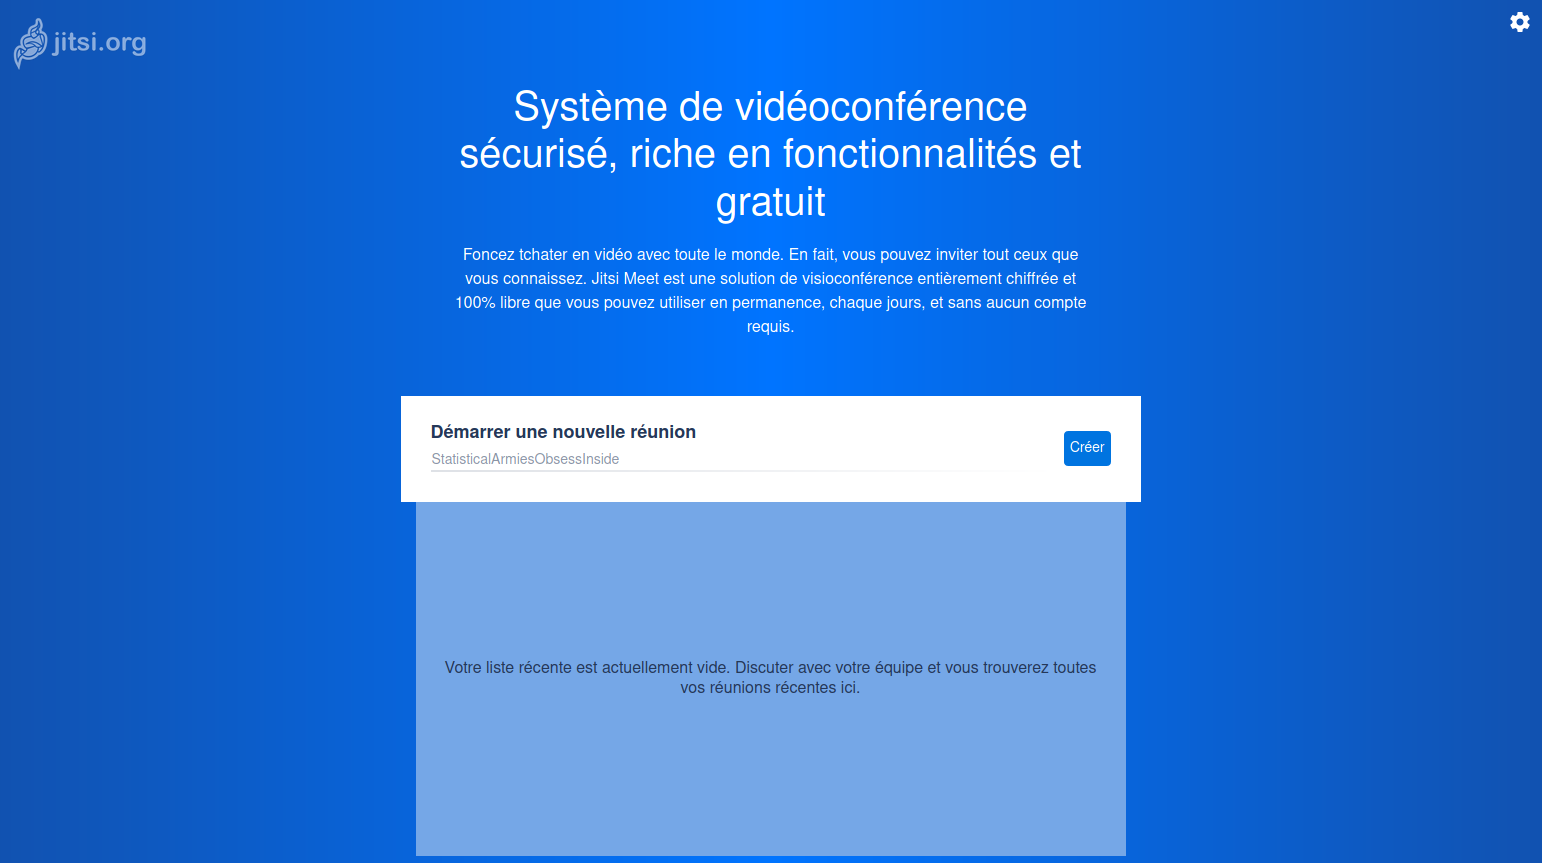 content/service/meet/images/1-0.png